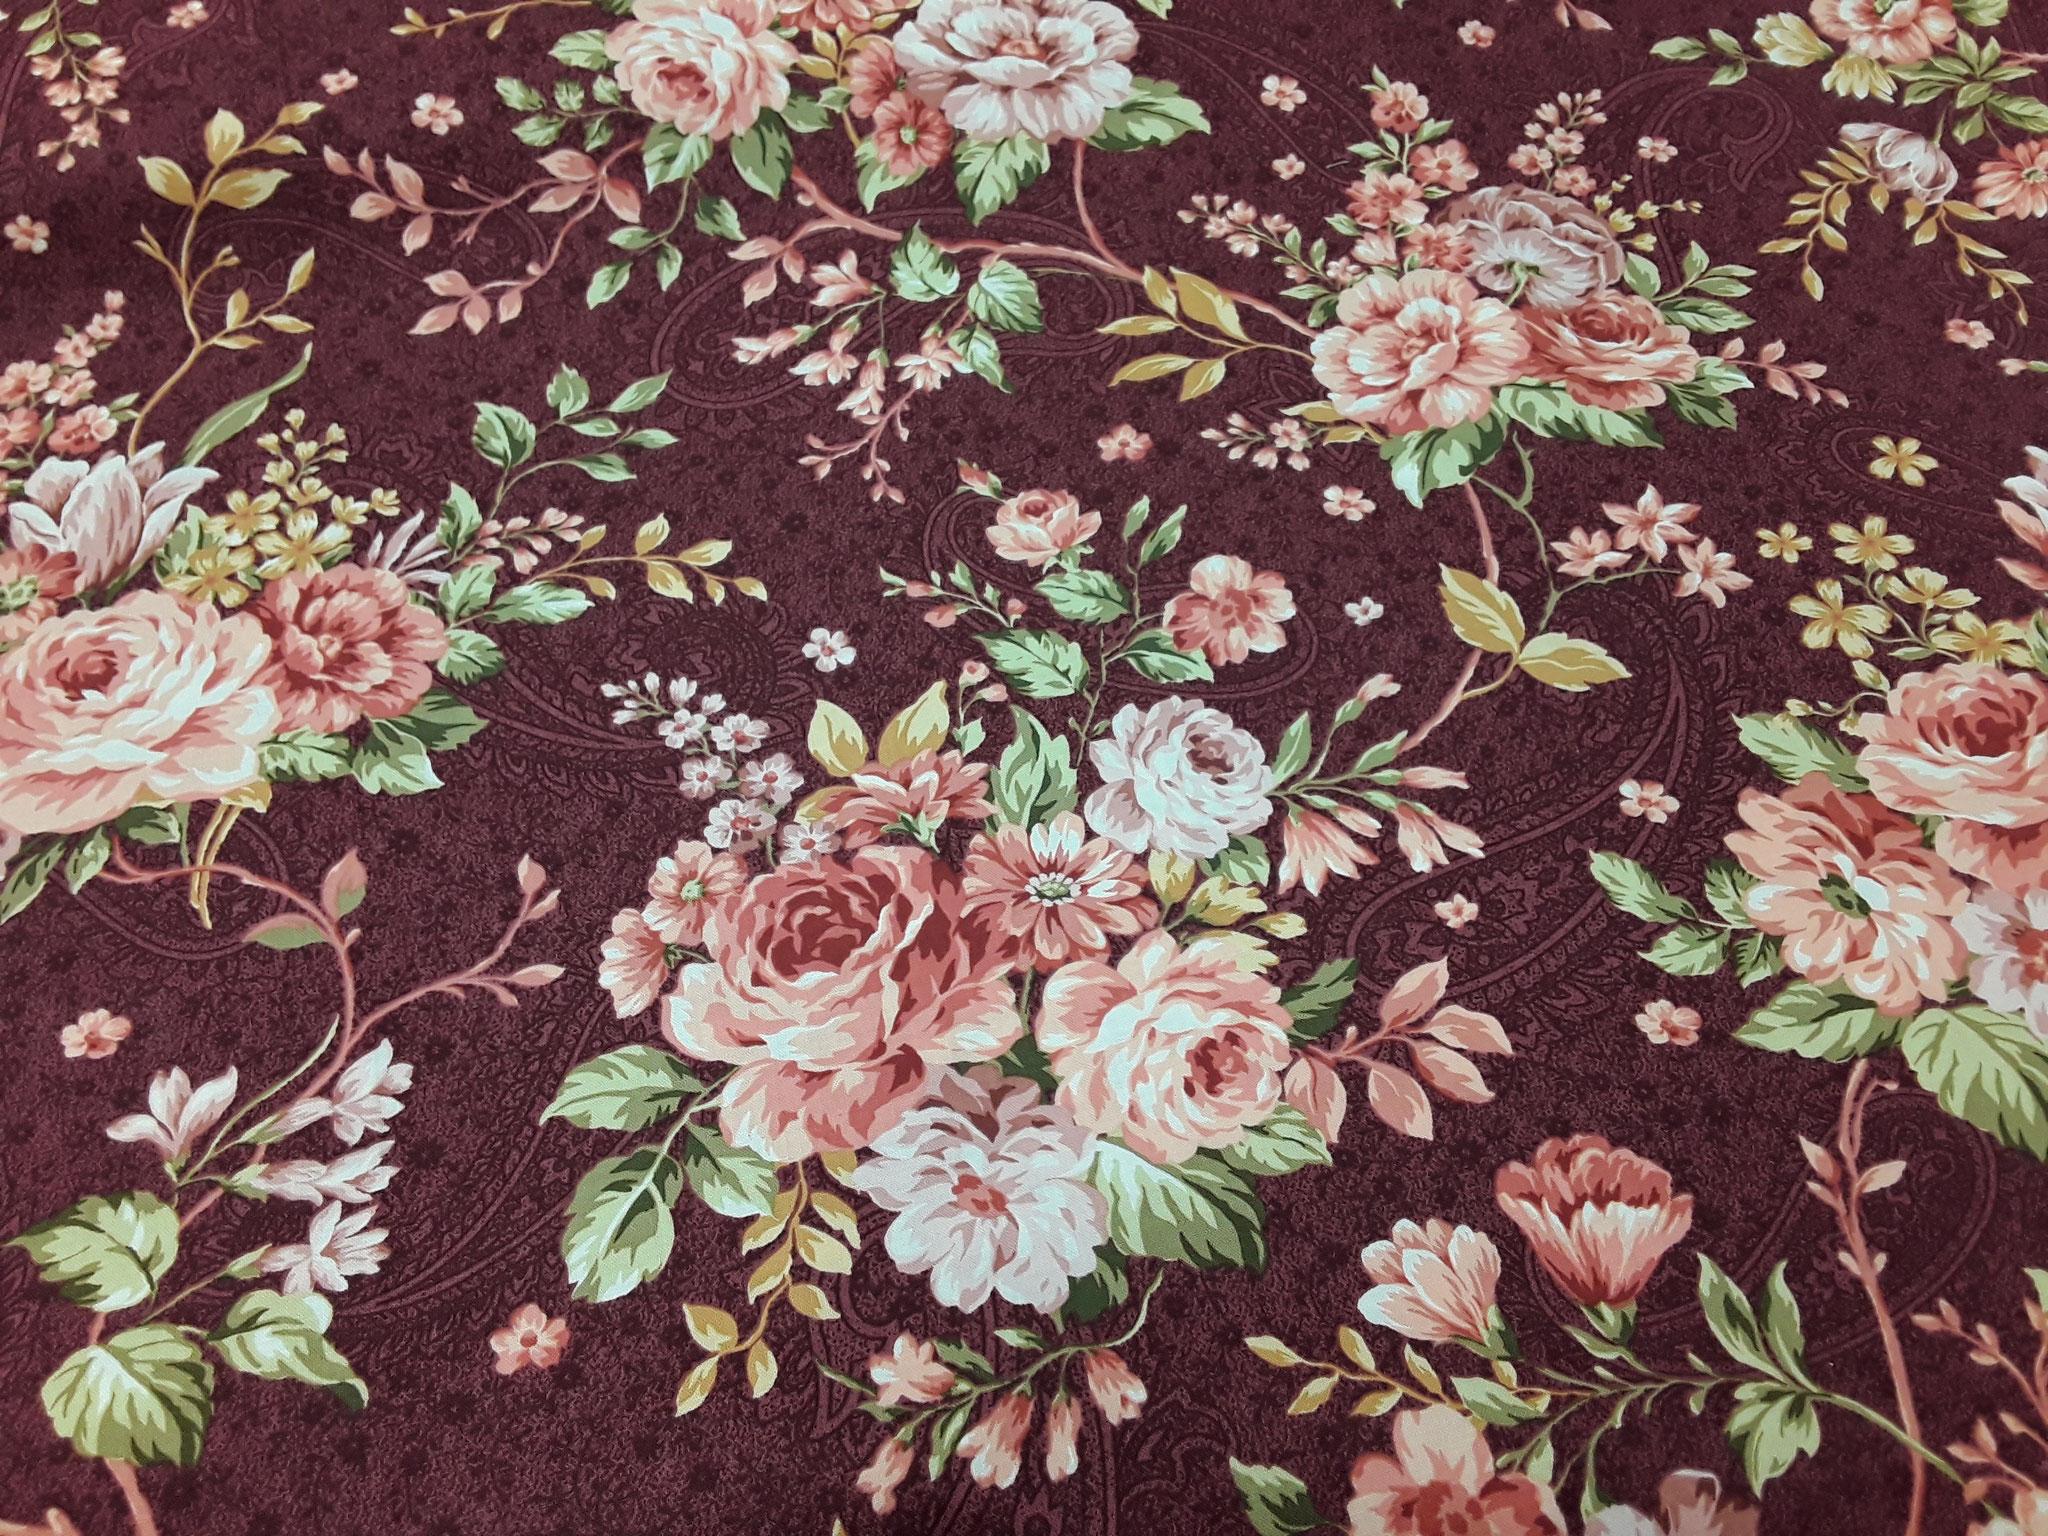 Baumwolle Blume/ Blüten/ bordeaux, 110cm breit, 9.50€